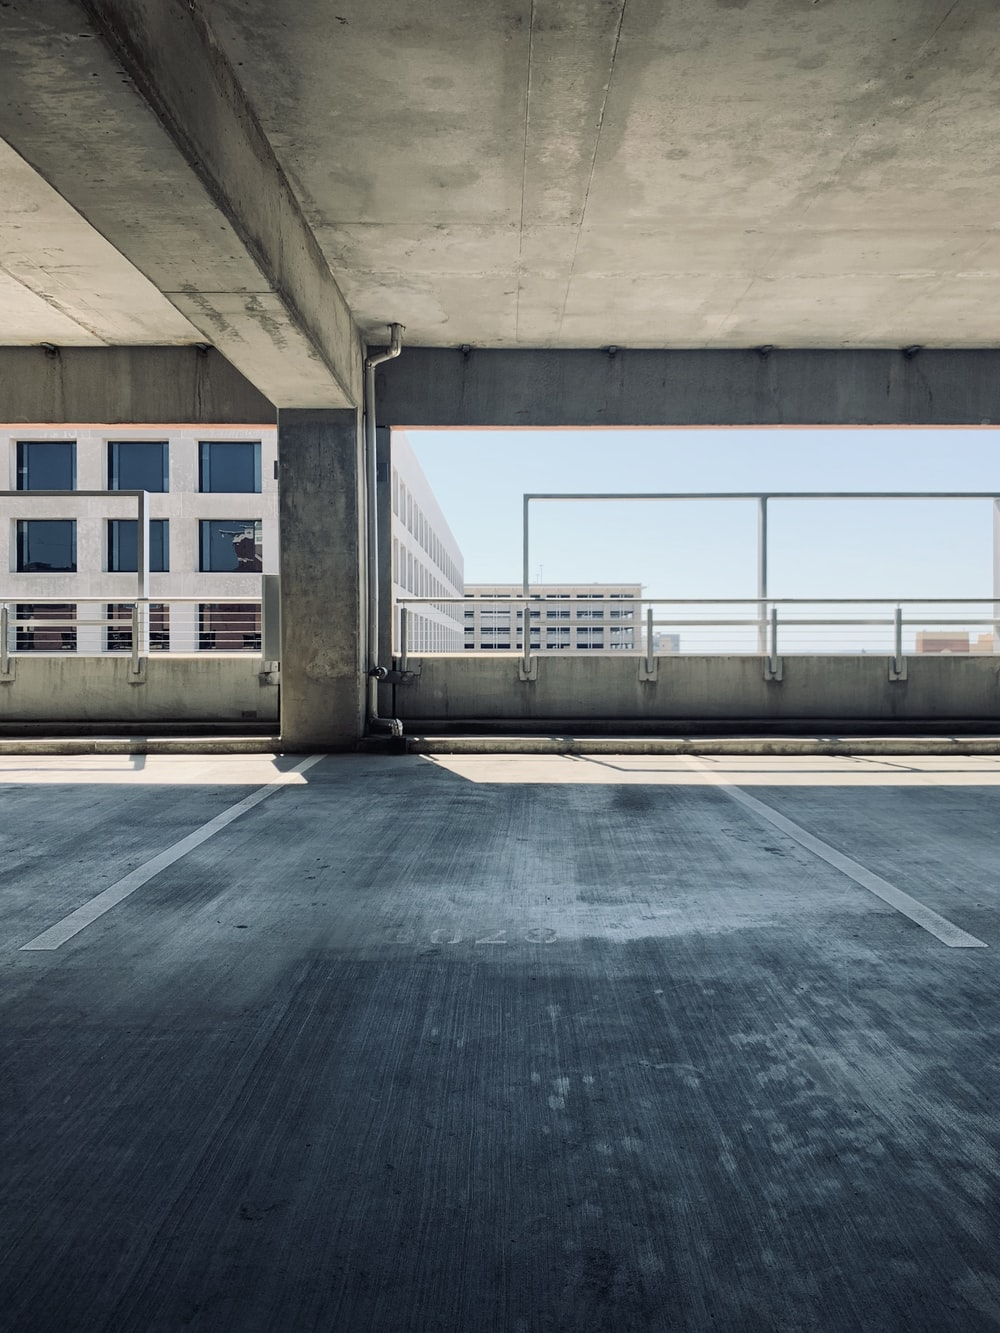 gray concrete parking area in building